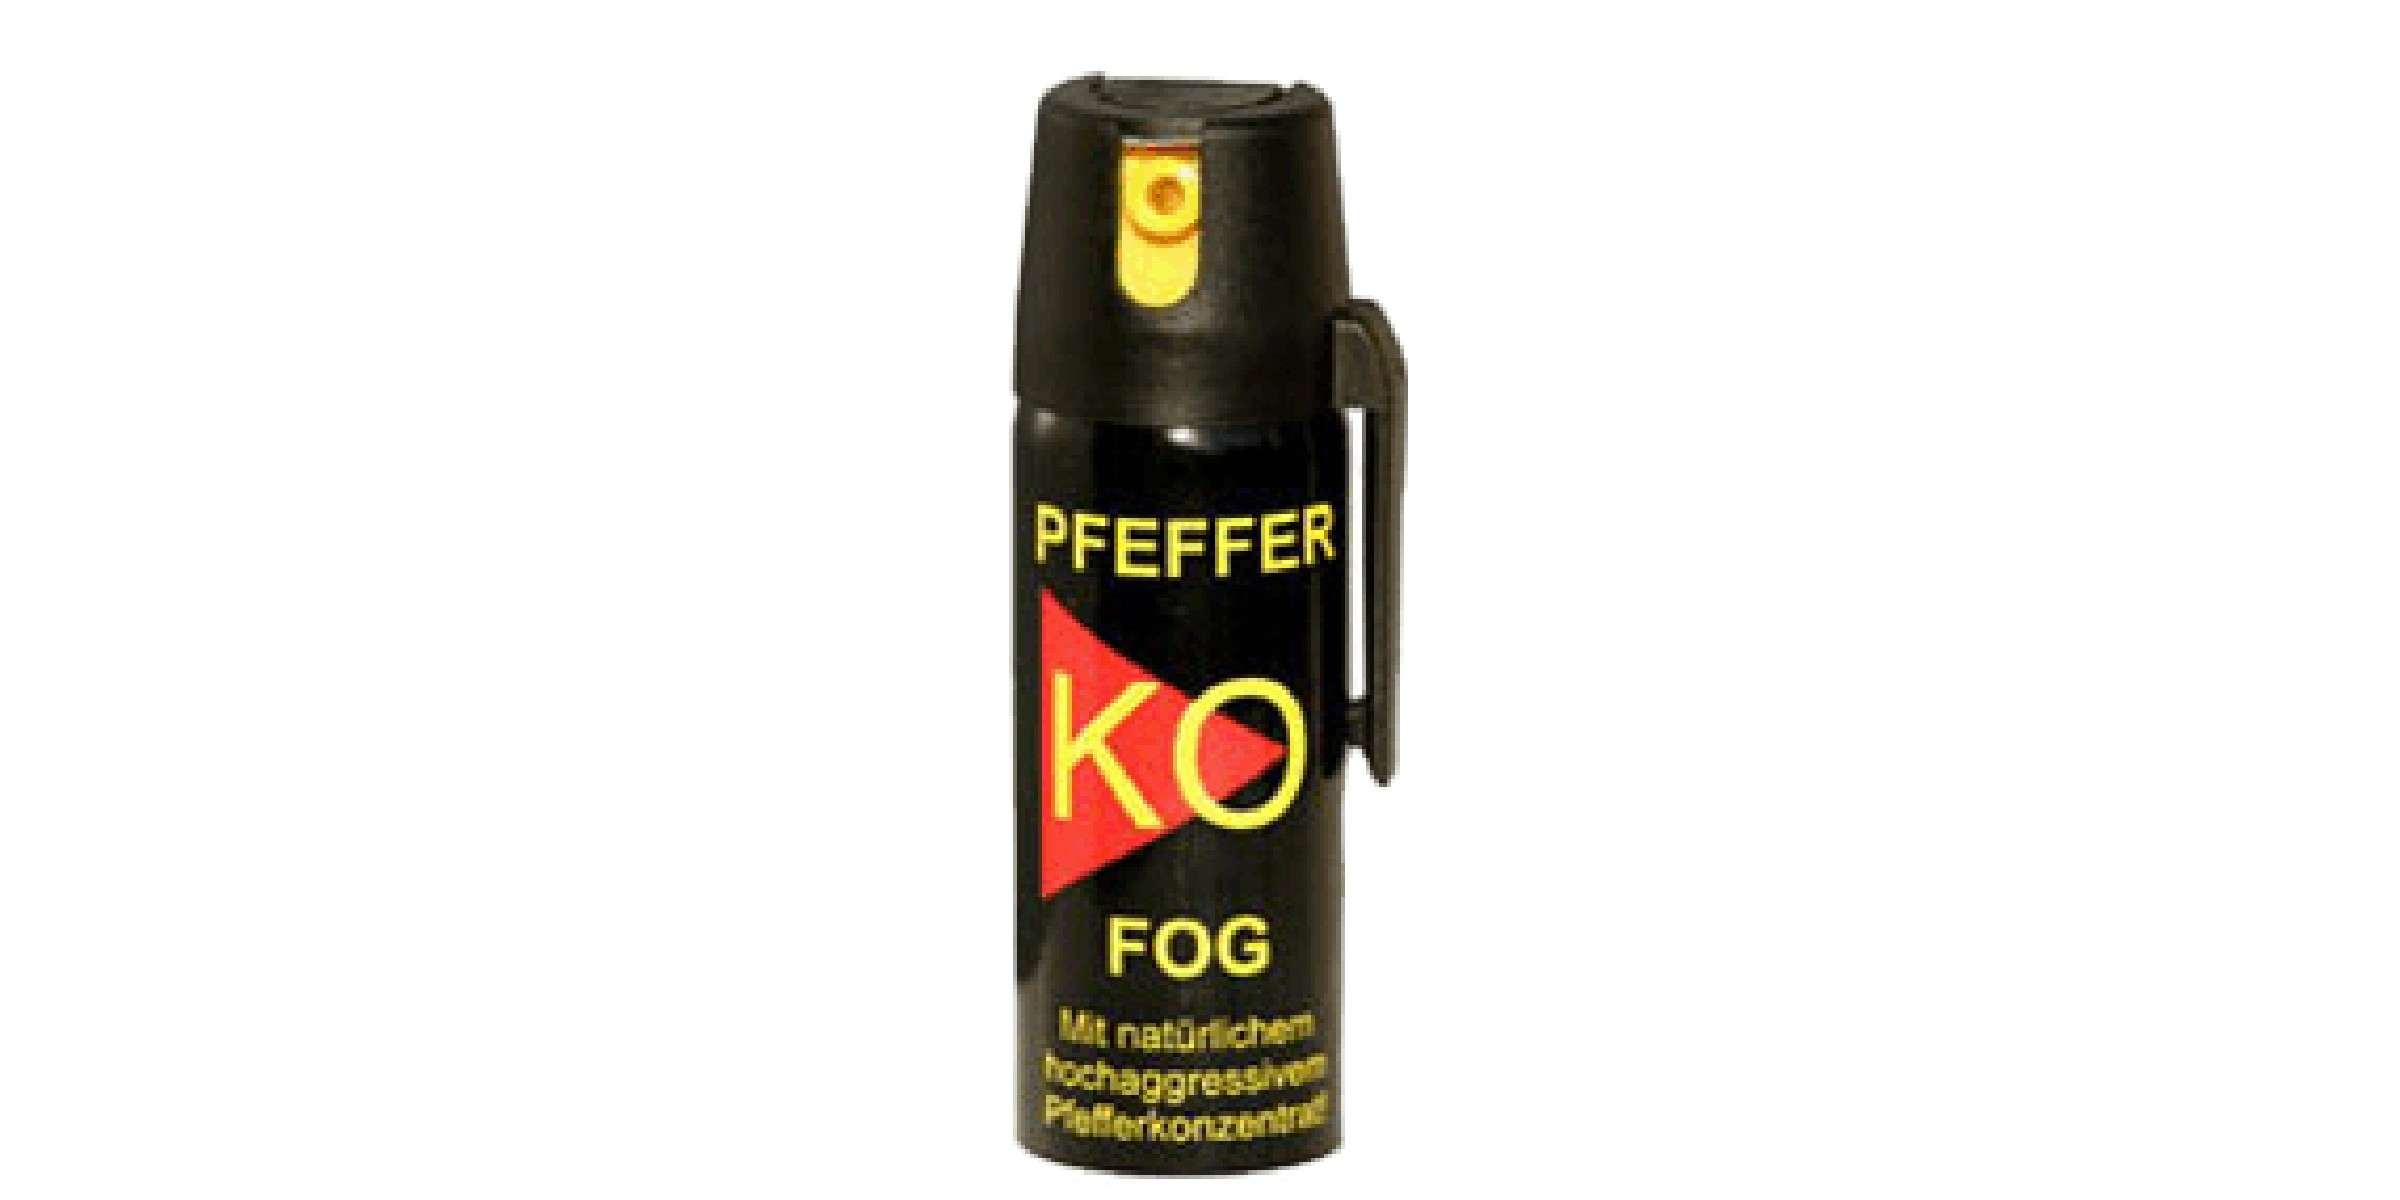 Lo spray al peperoncino è legale?